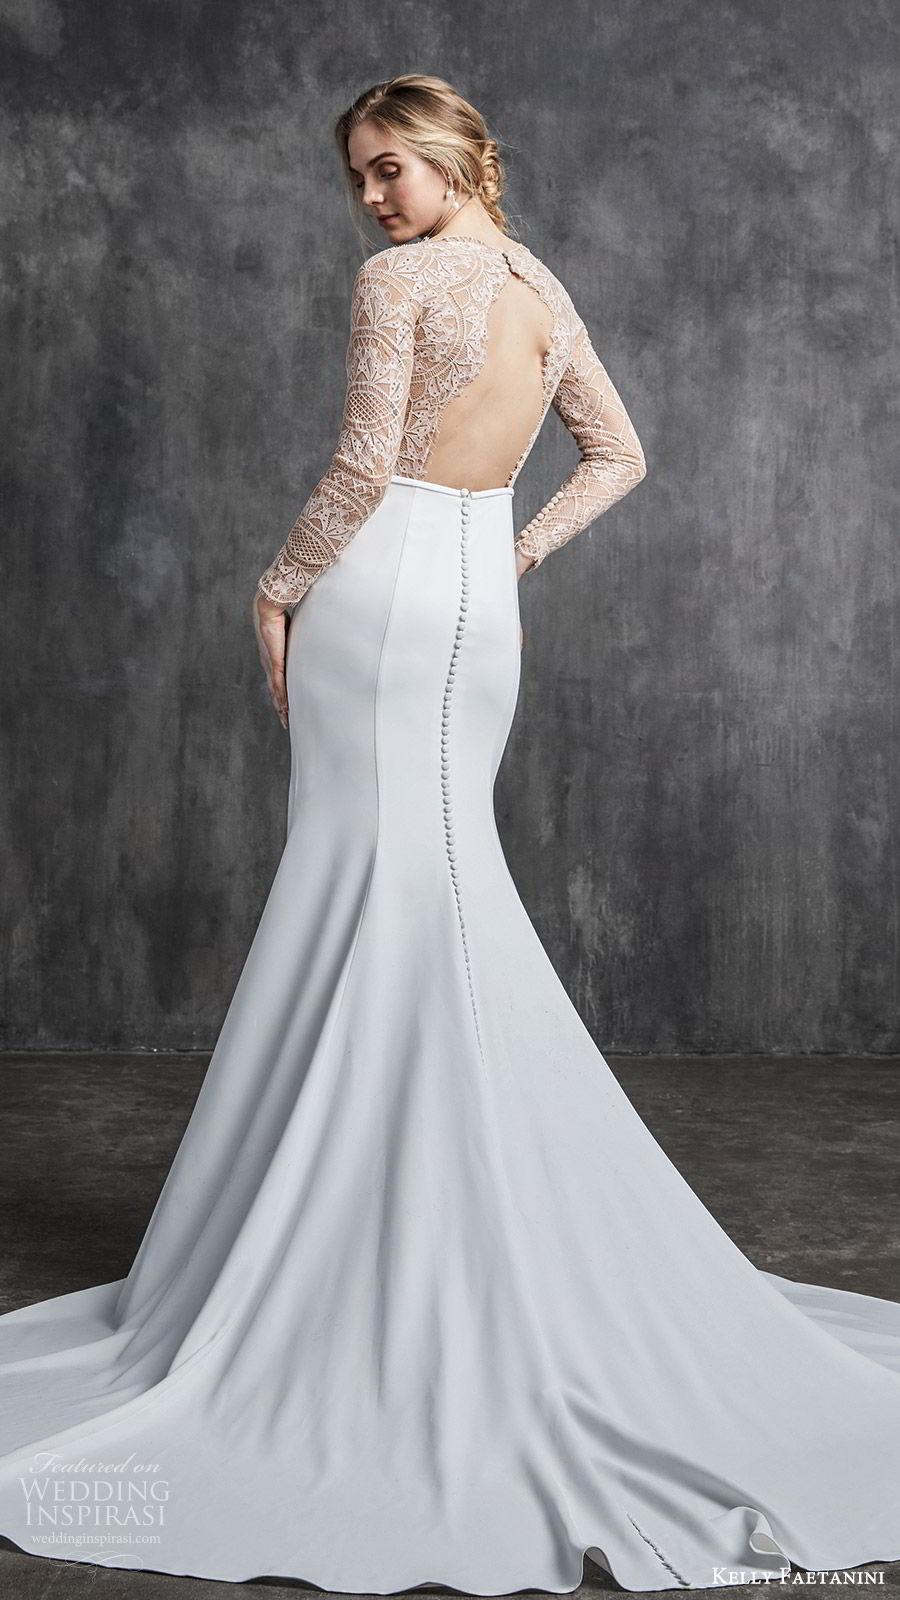 kelly faetanini spring 2020 bridal illusion long sleeves v neckline lace bodice fit flare modified a line mermaid wedding dress (2) chapel train elegant nude color keyhole back bv